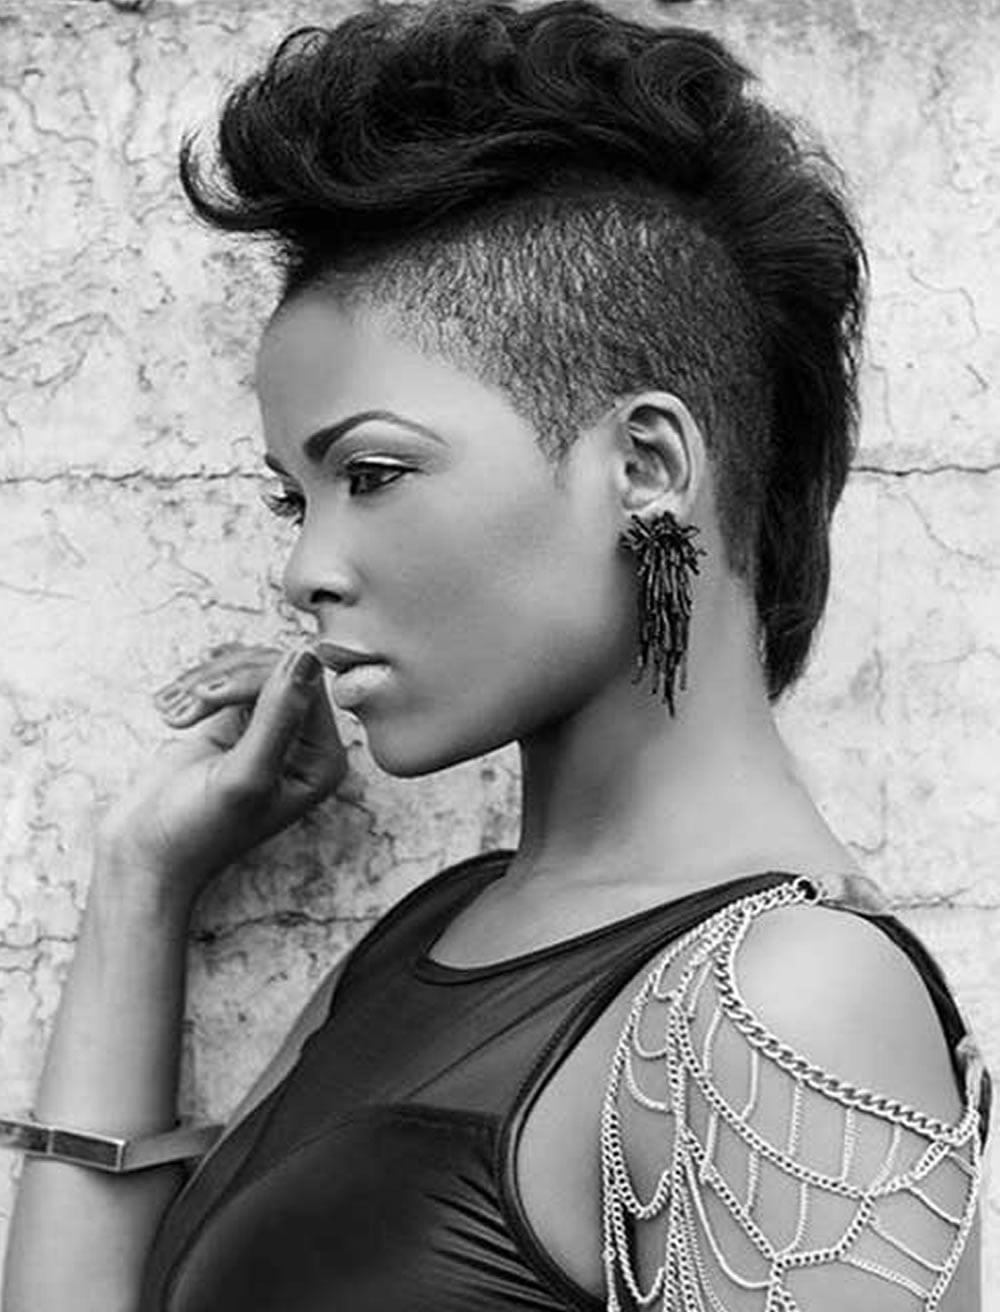 Mohawk black women hairstyles for summer 2018-2019